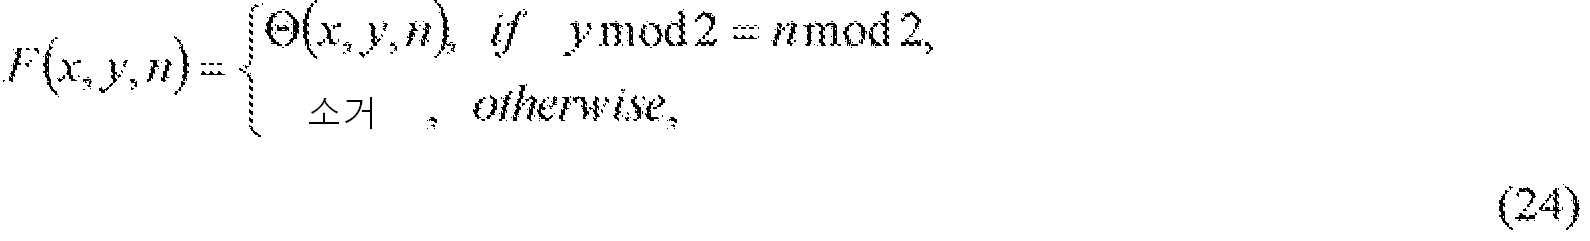 Figure 112008076058963-pct00010